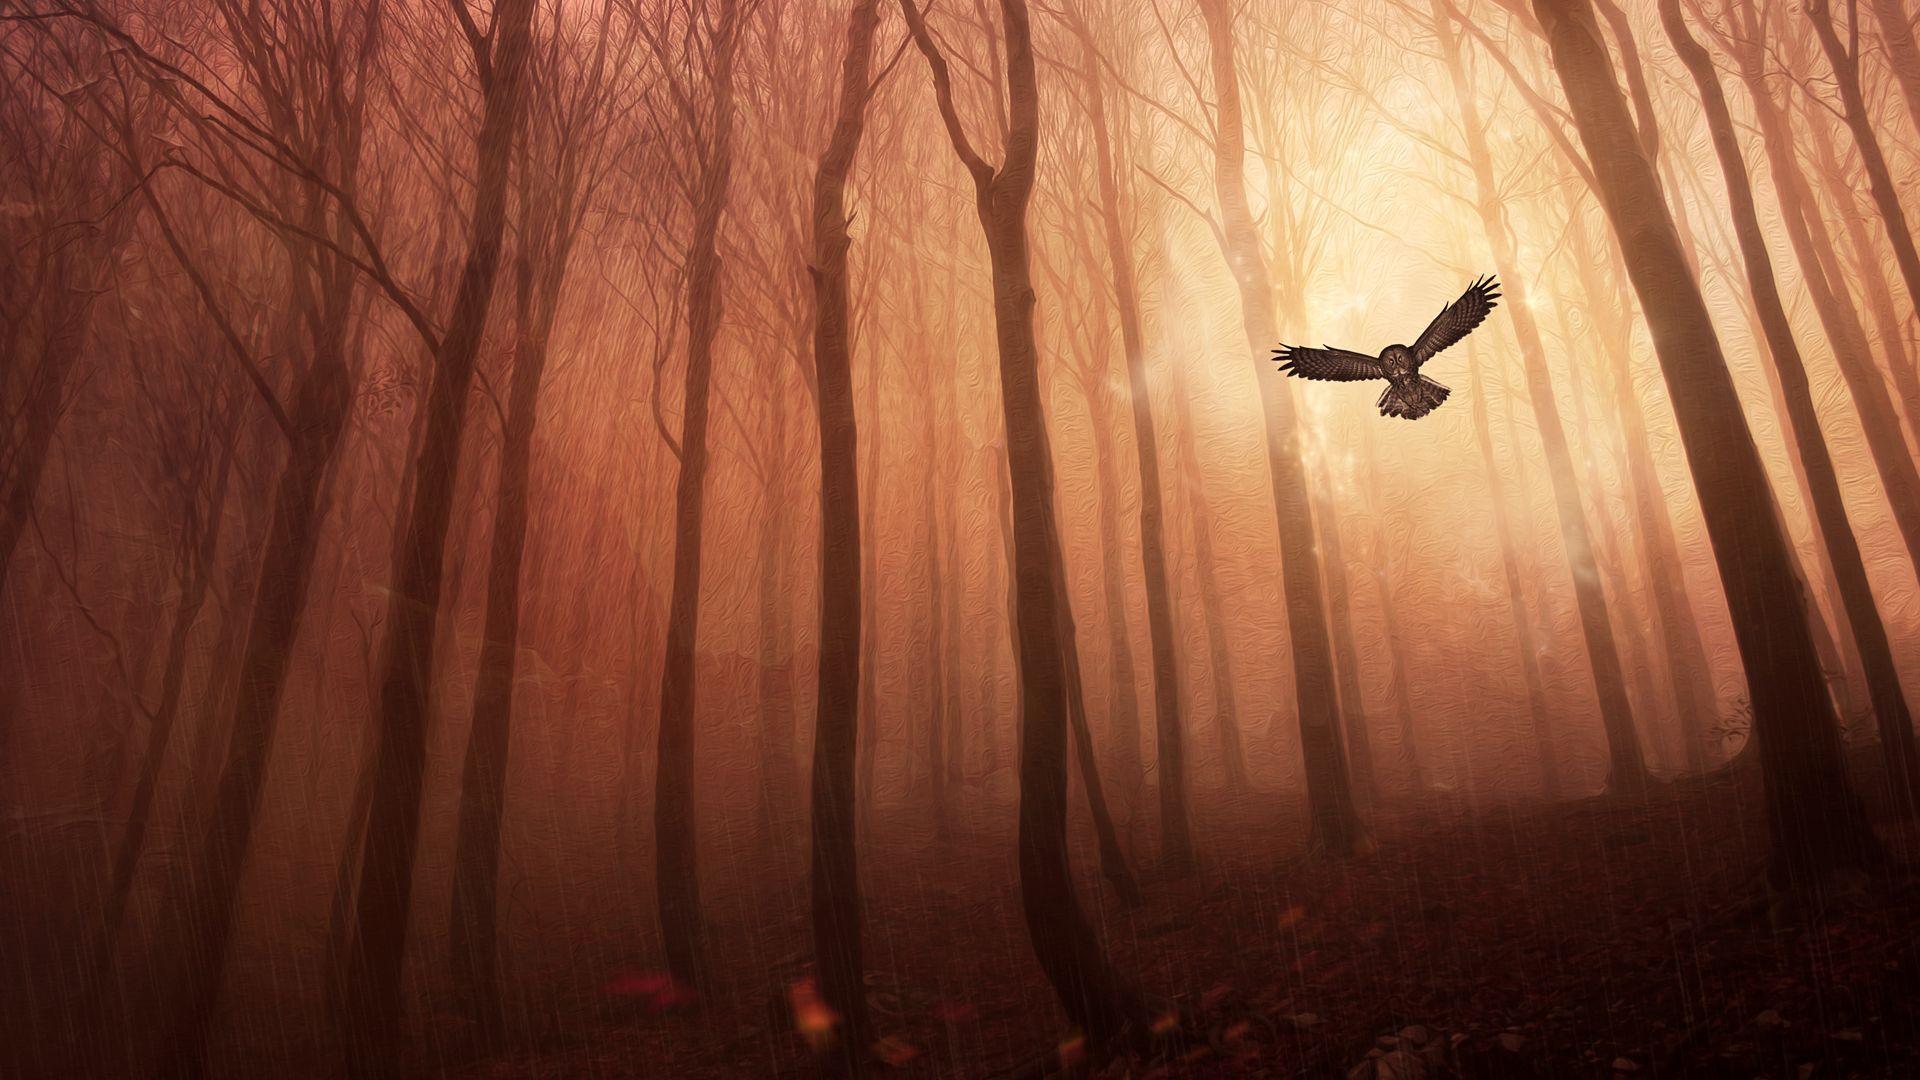 Owl flying in the rain wallpaper 17949 1920x1080